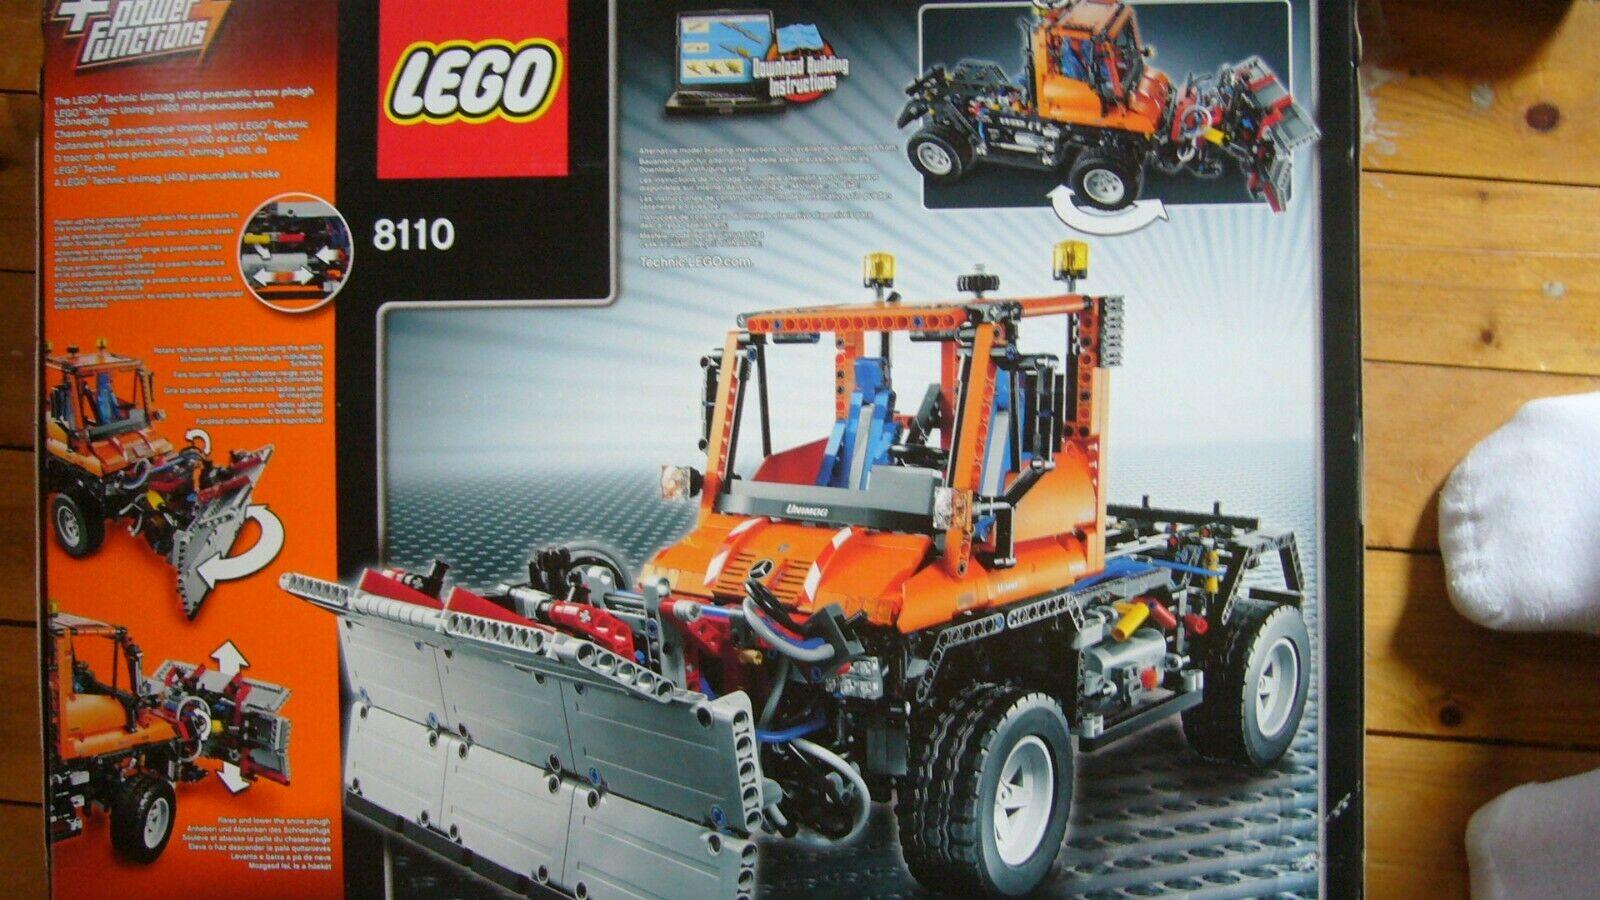 Spriegel schwarz für Unimog U400 #8110 NEU Lego Technic Technik Plane